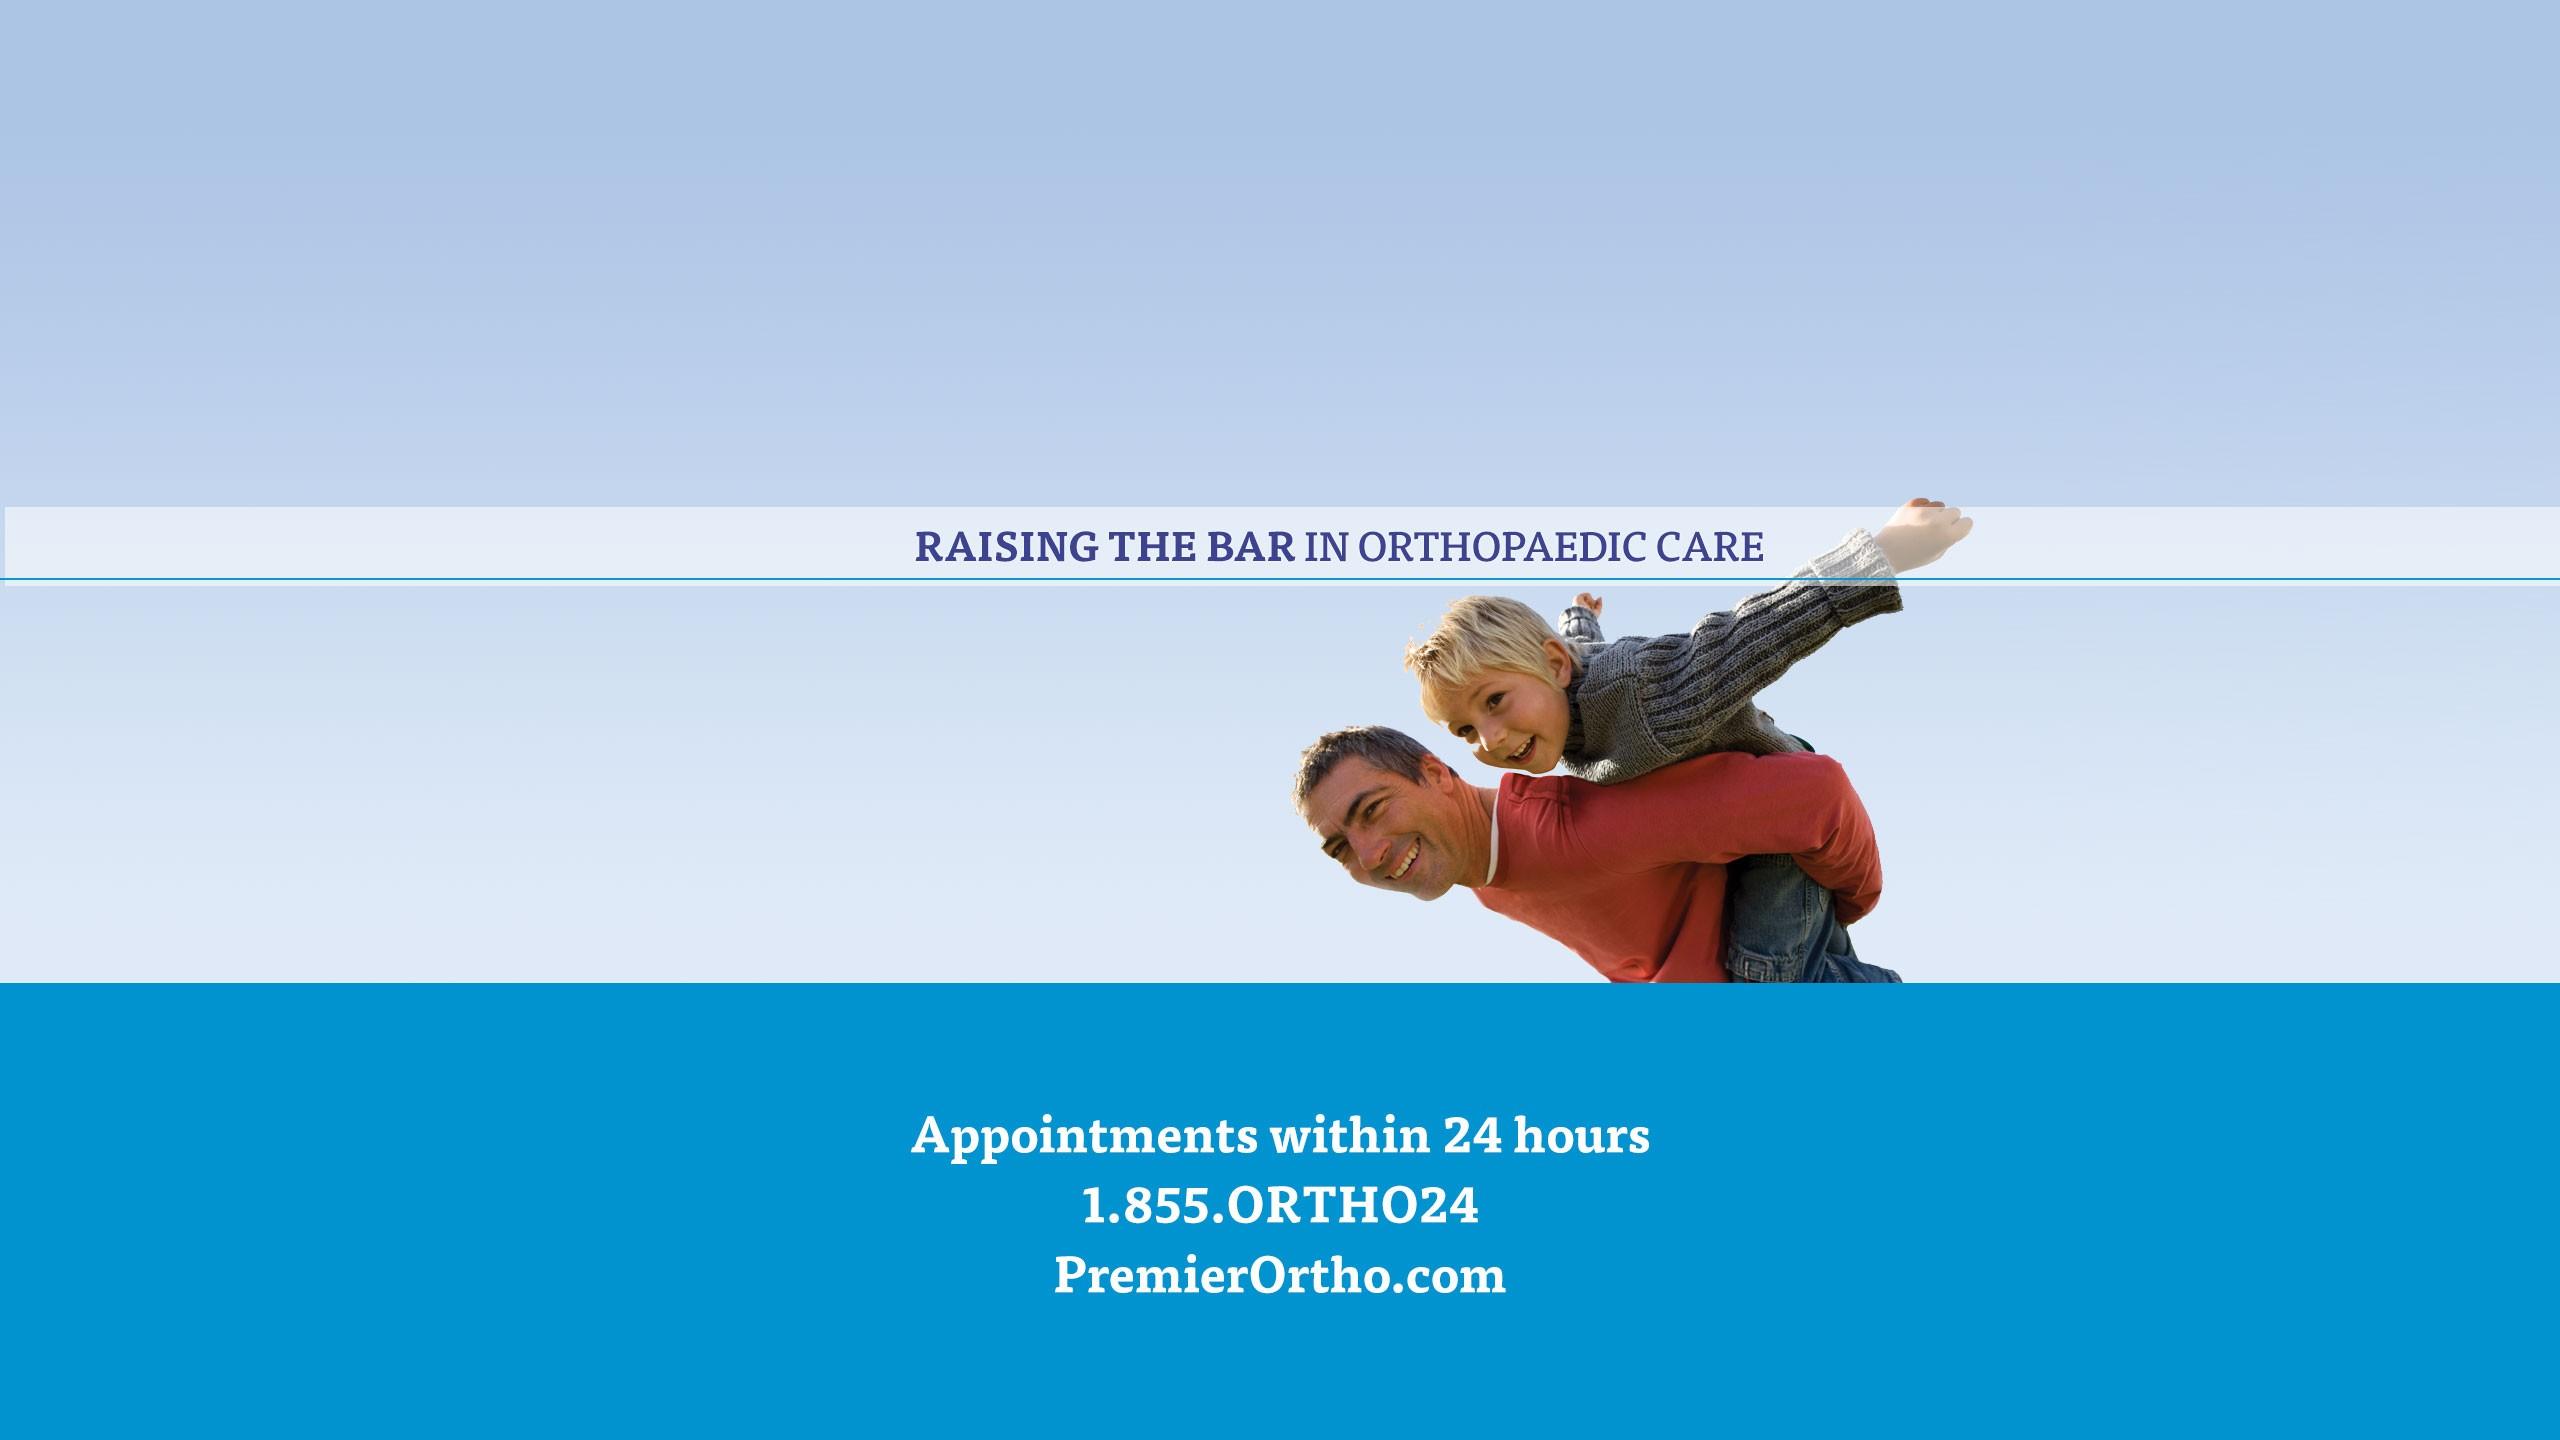 Premier Orthopedic Group